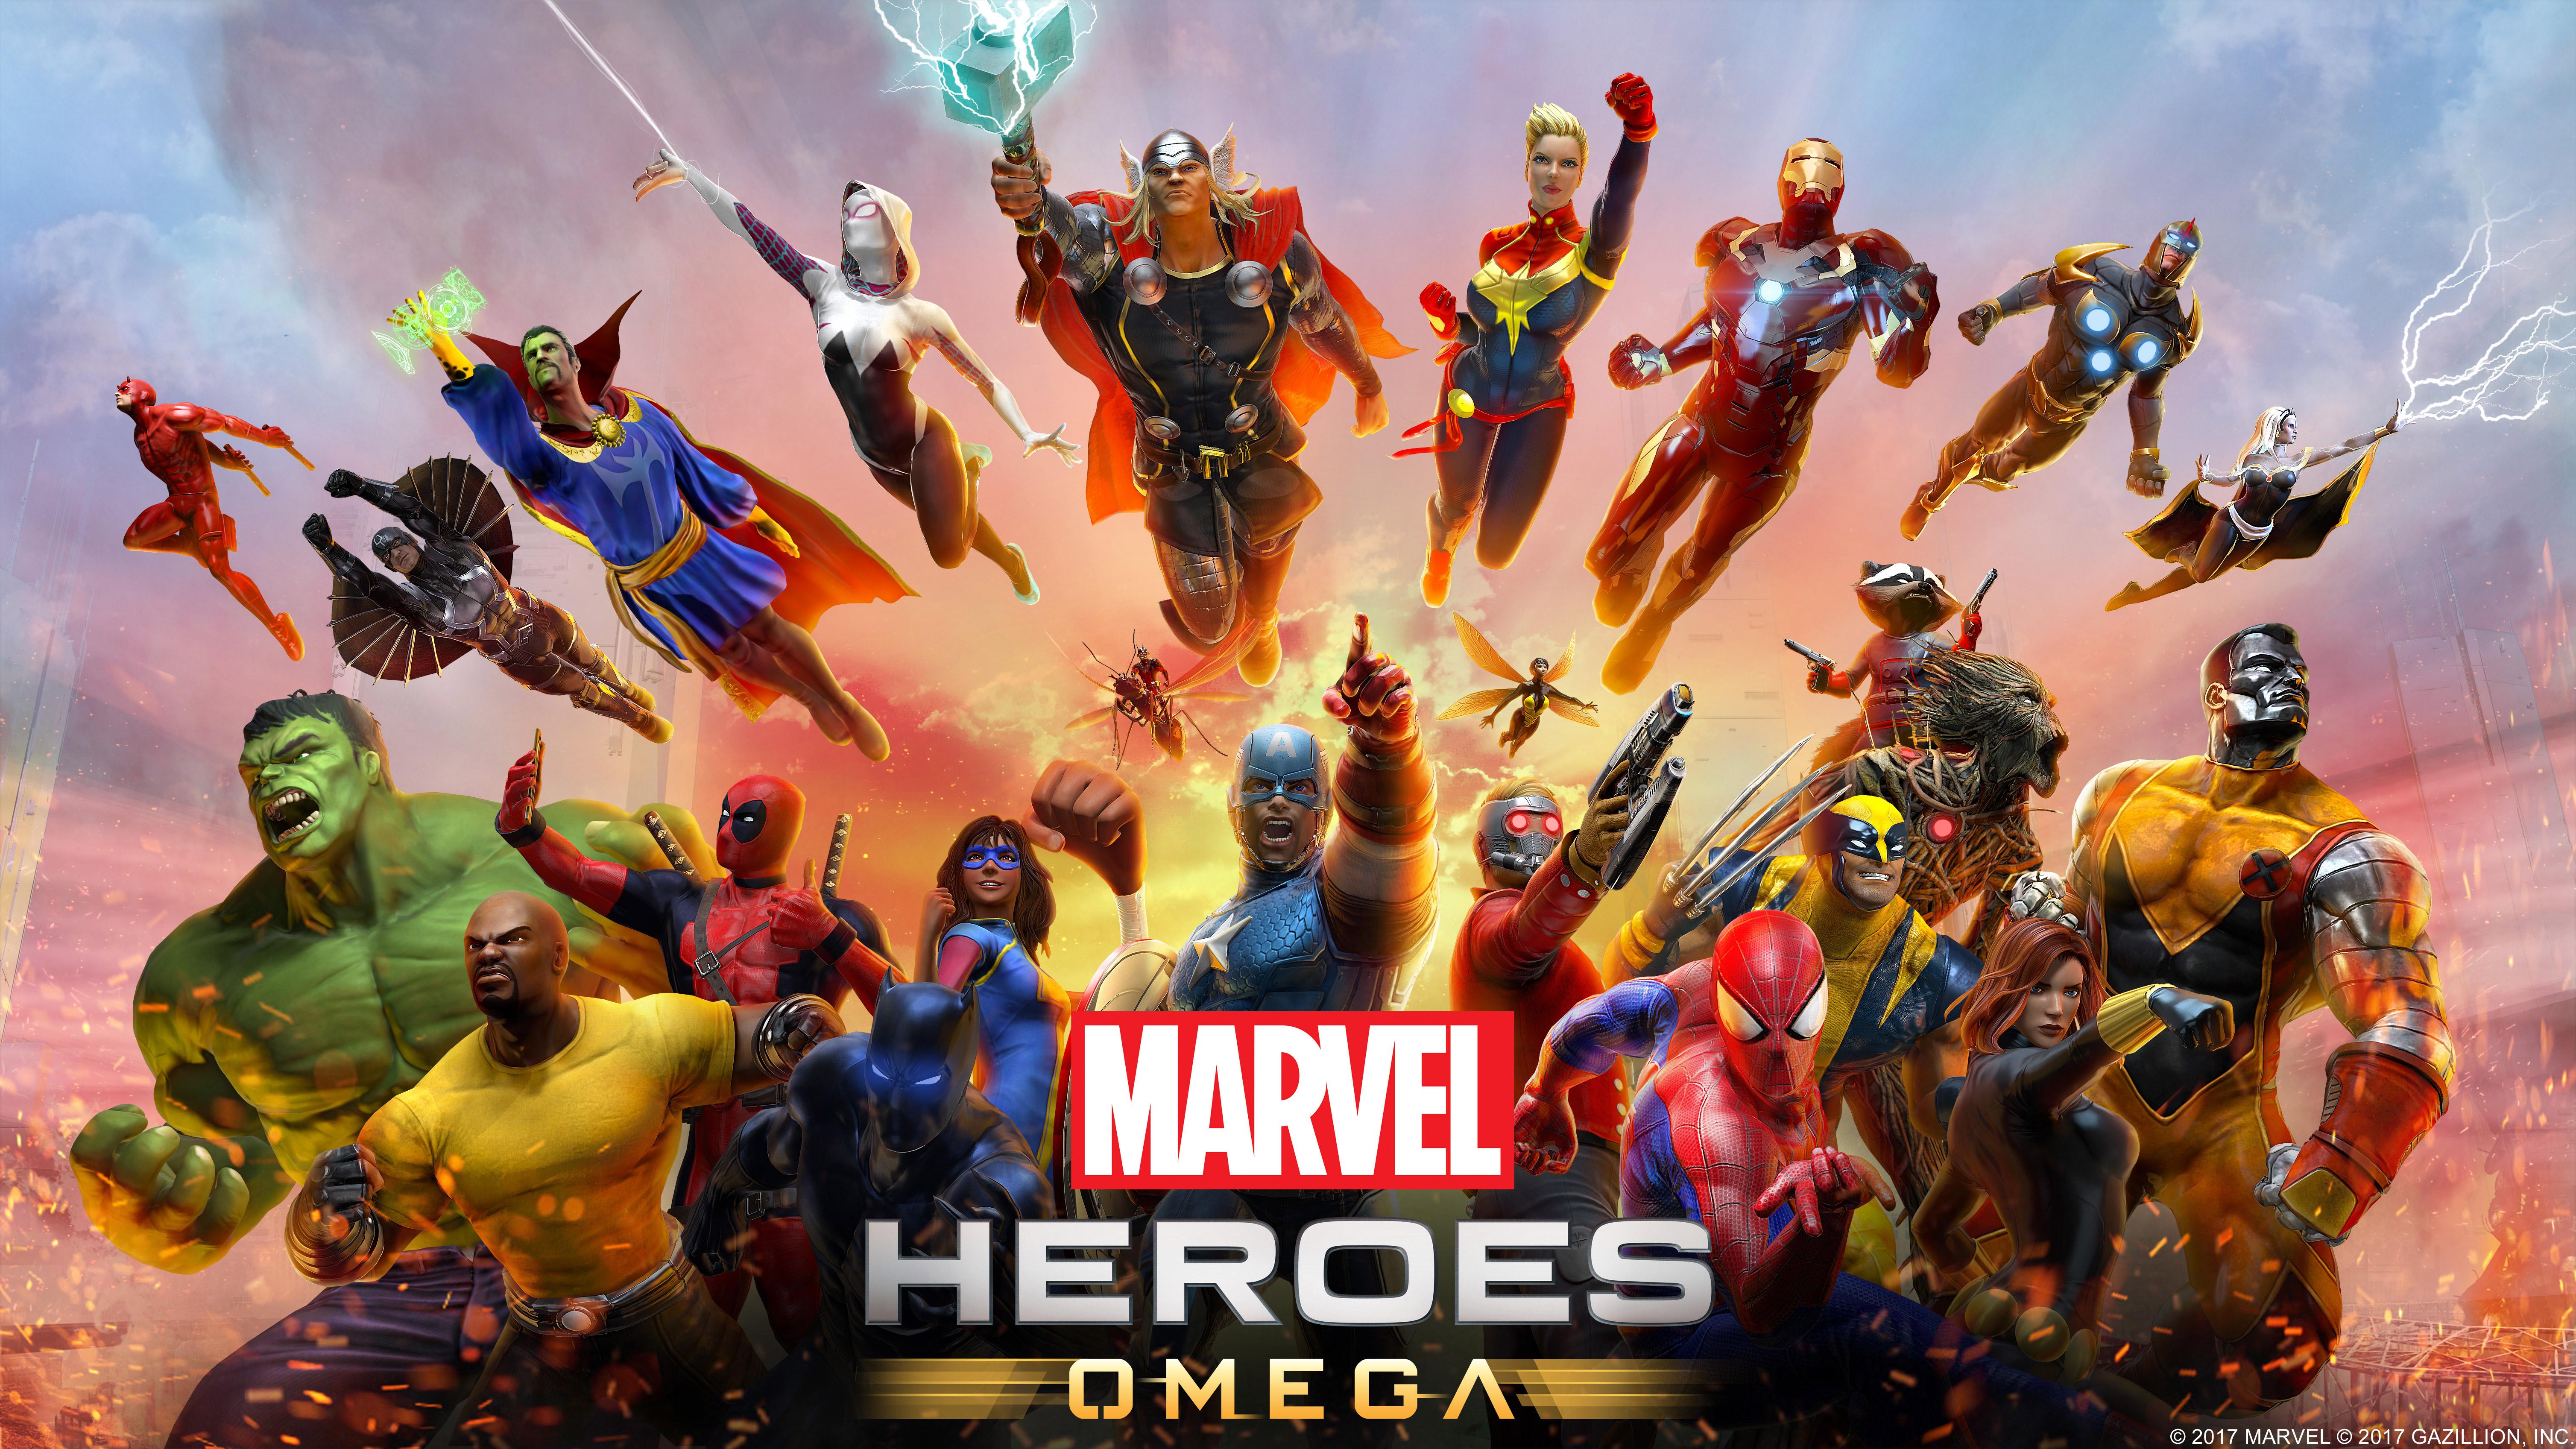 Marvel Heroes Omega HD Games 4k Wallpapers Images Backgrounds